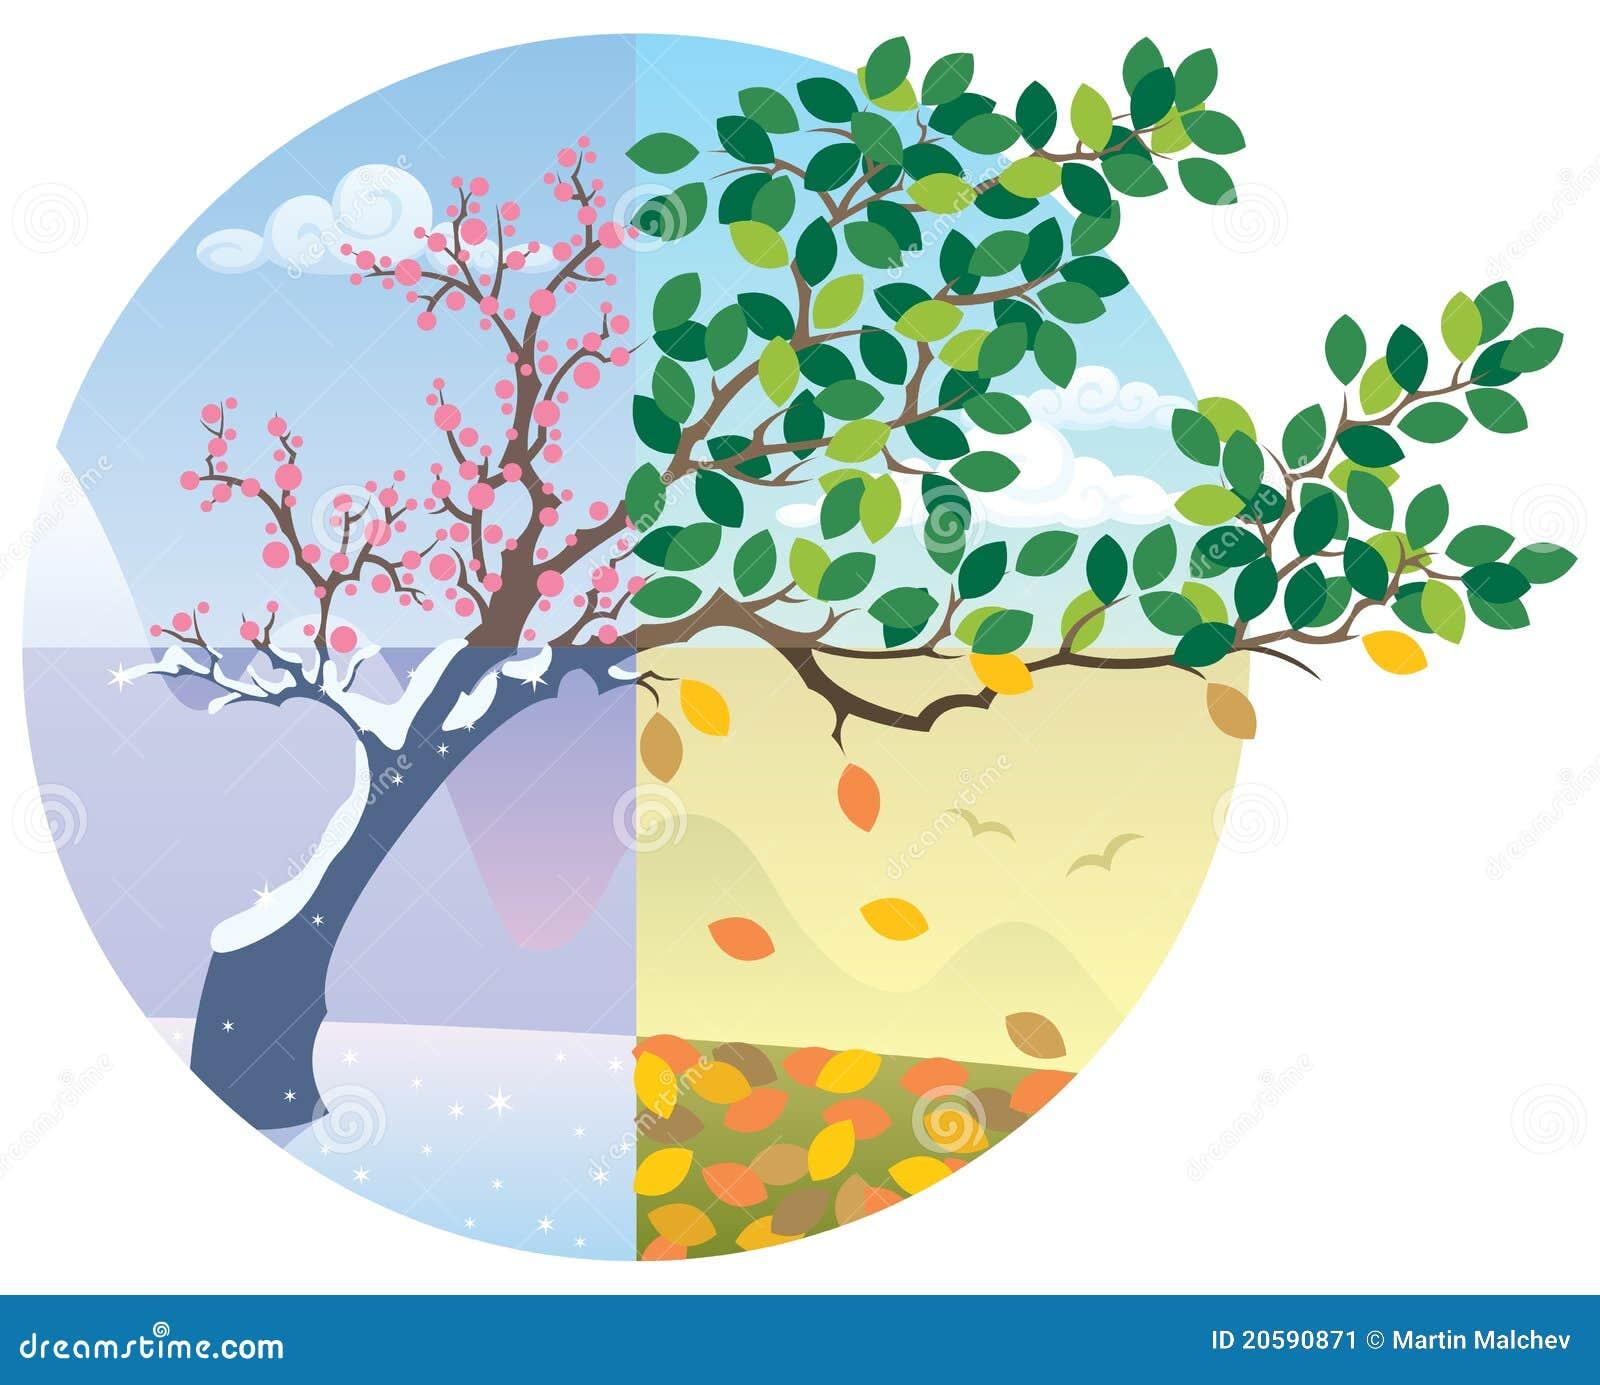 download trees earth and torah a tu bshvat anthology